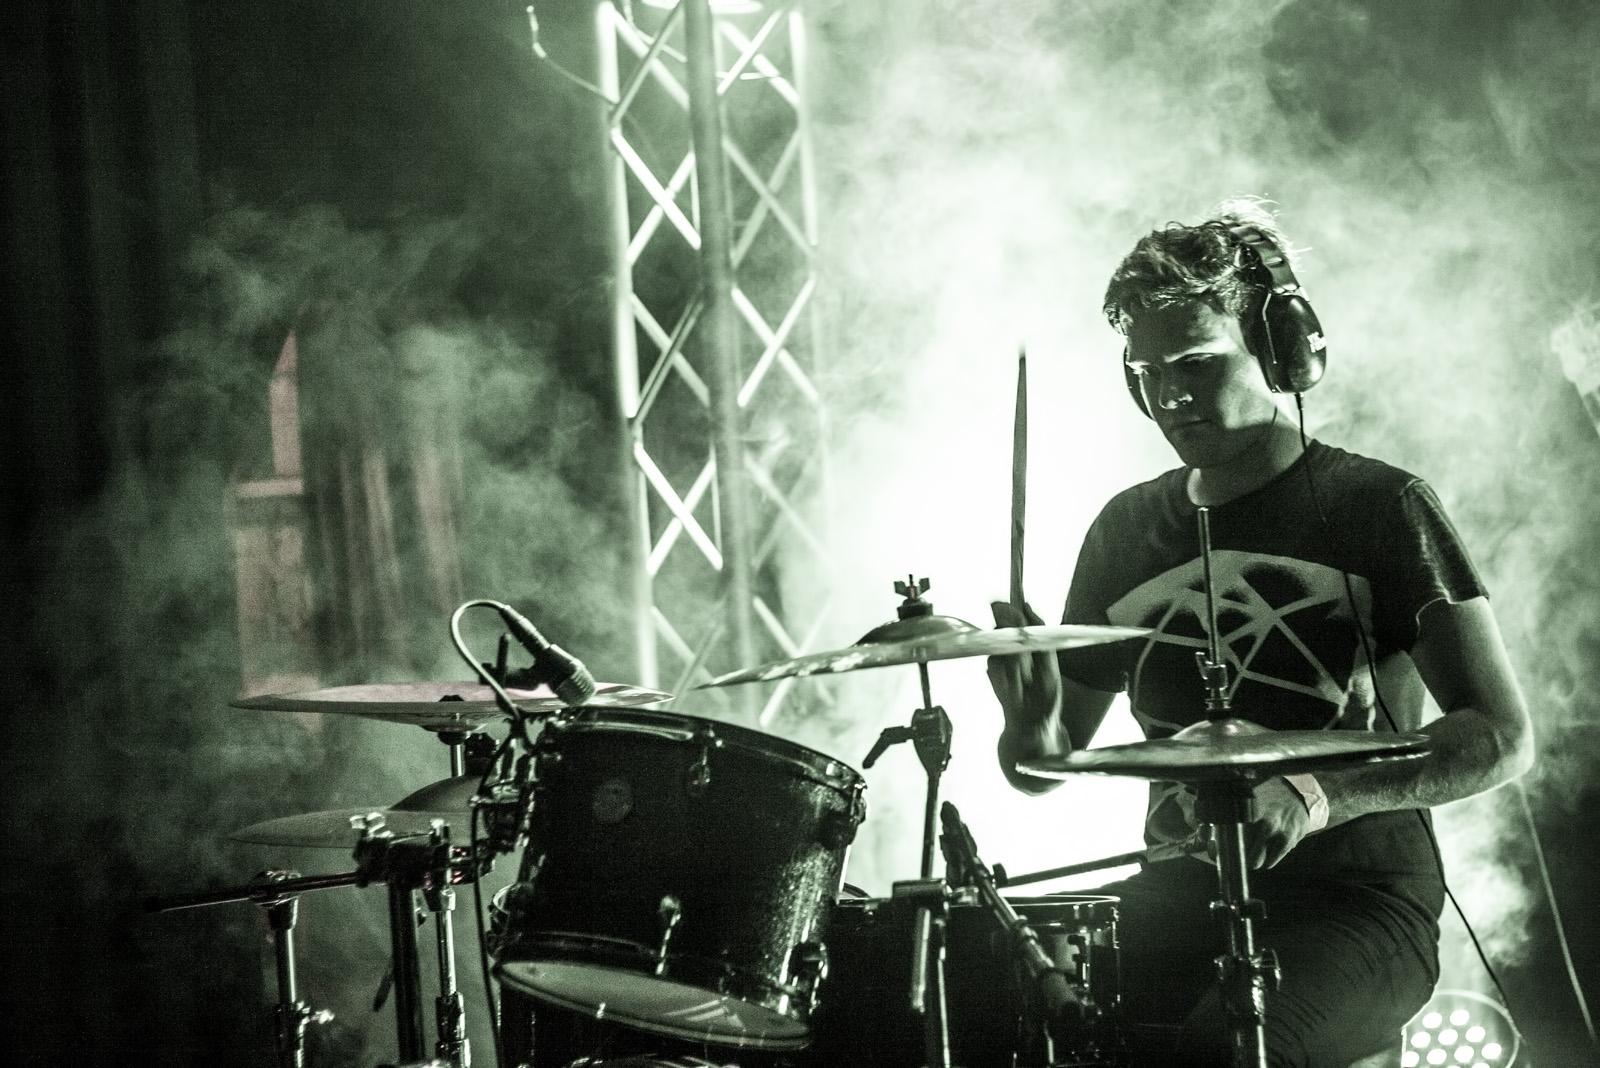 Scott Miller on Drums